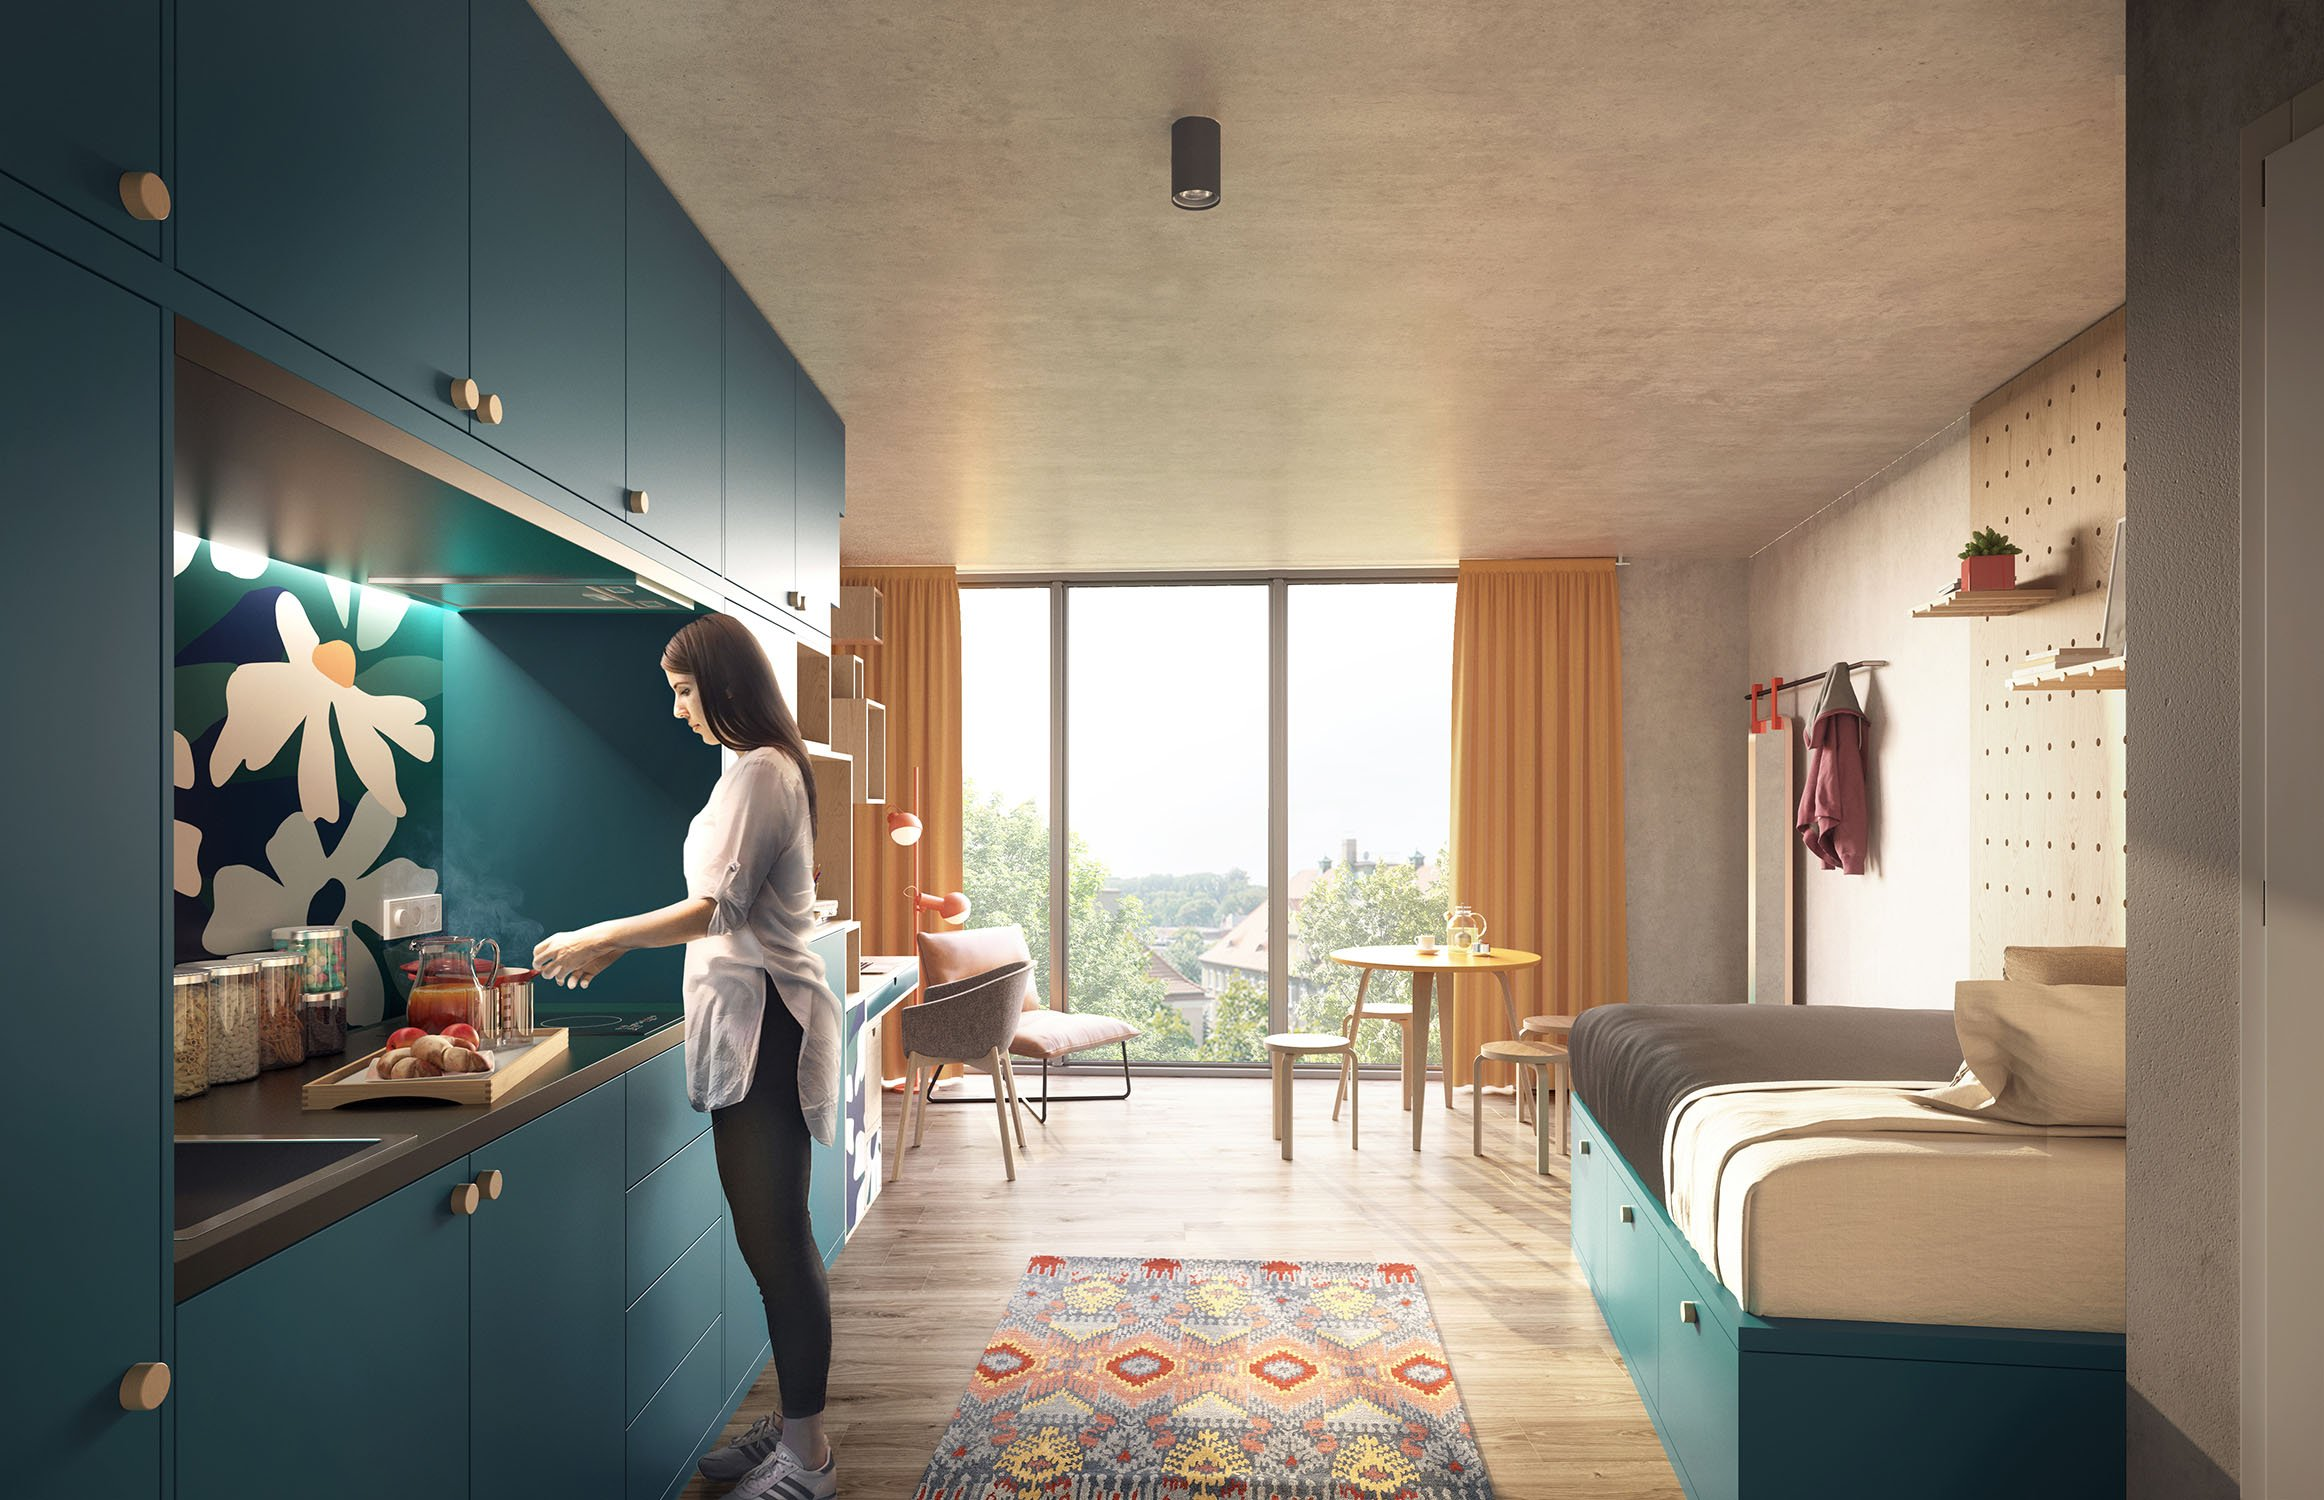 Room interior Render by Studio Aisslinger